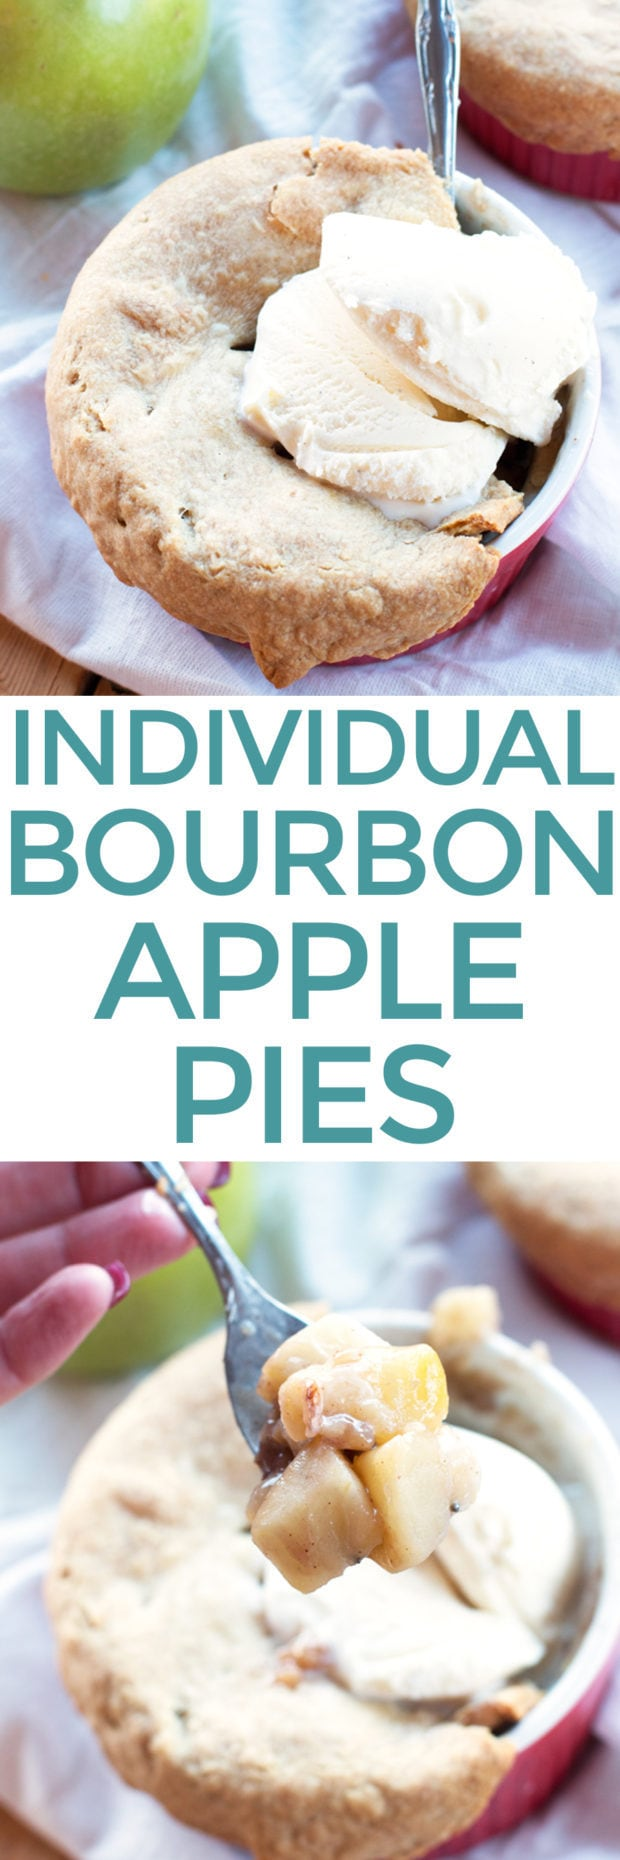 Individual Bourbon Apple Pies | cakenknife.com #dessert #thanksgiving #fall #applepie